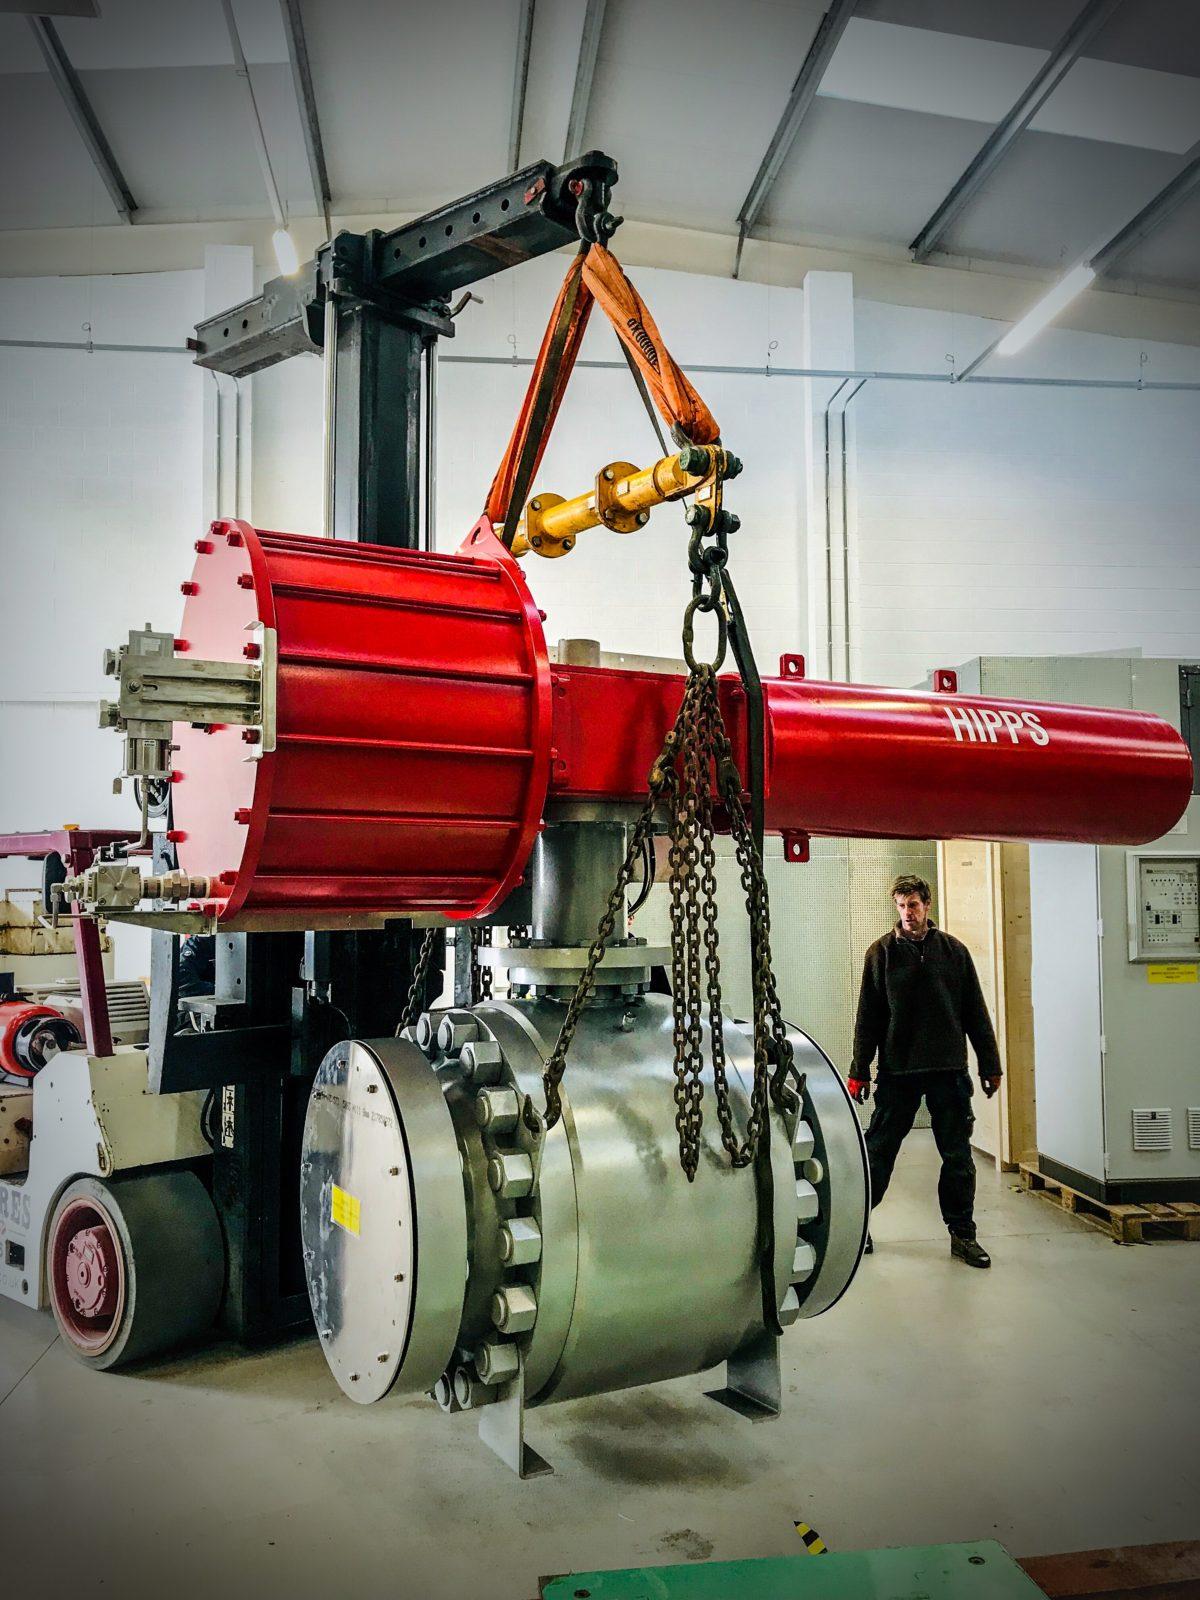 Extendable Heavy Duty Forklift